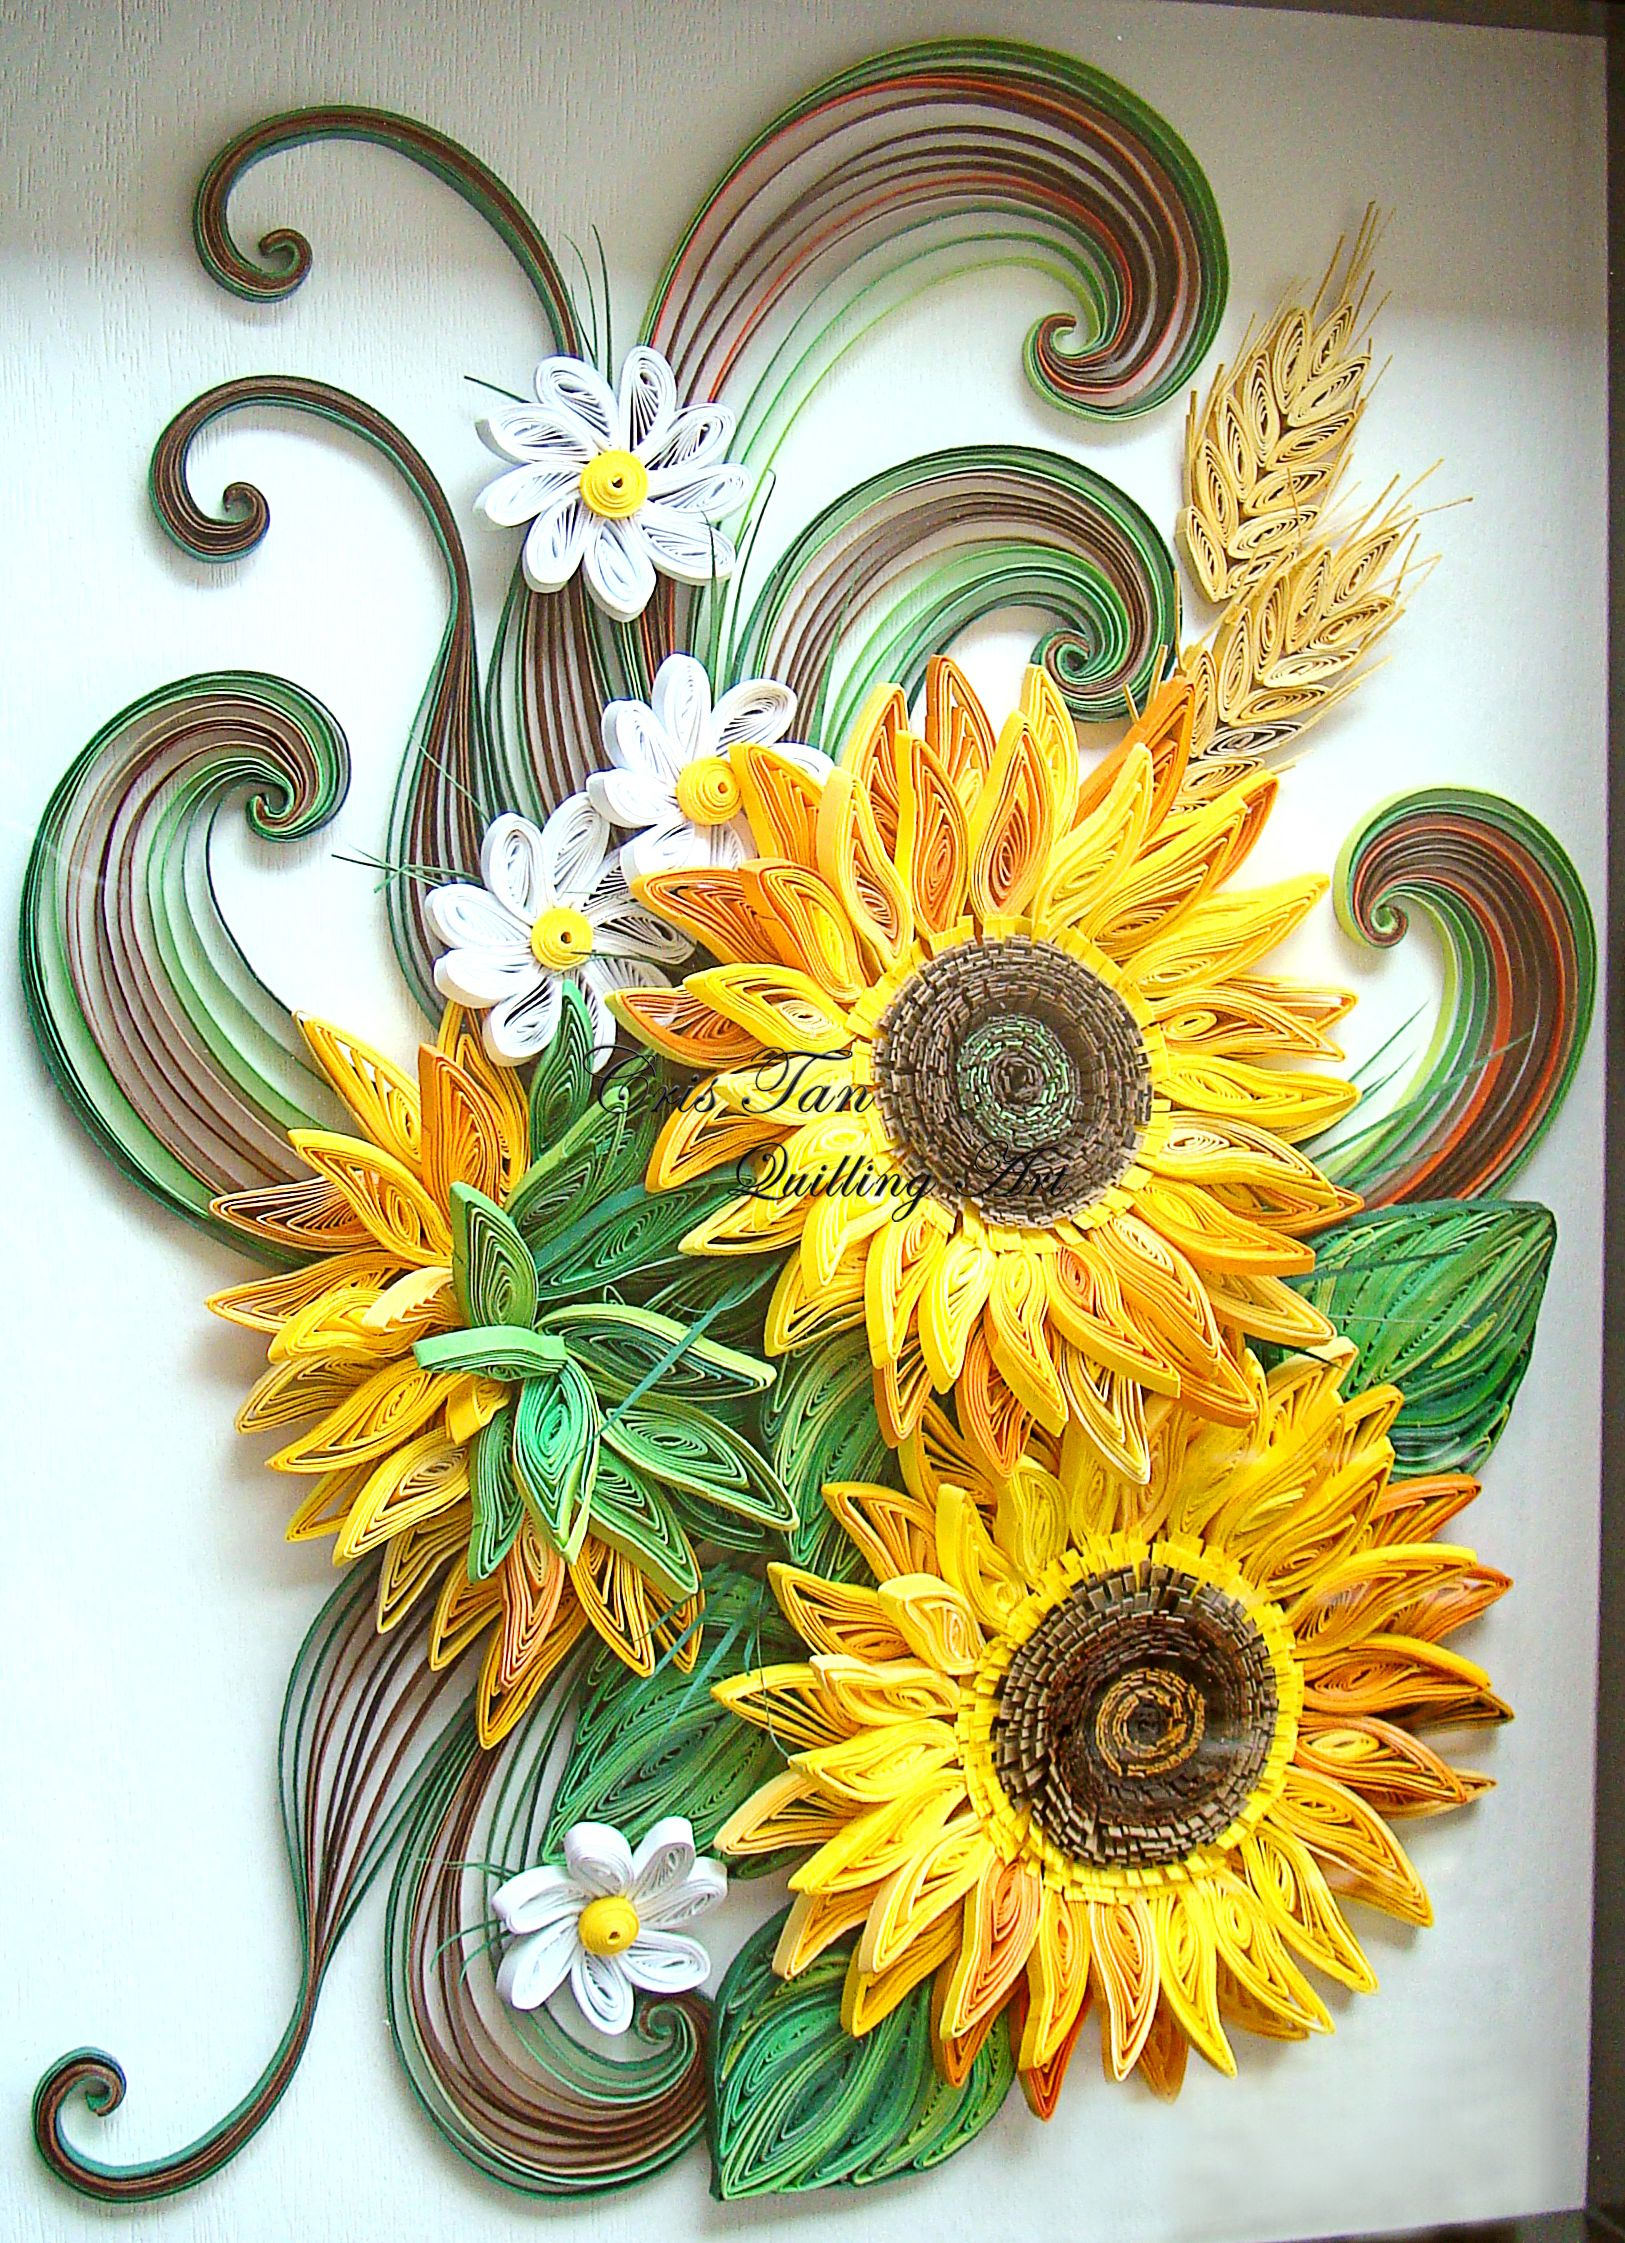 quilled sun flowers cris tan quilling art pinterest blumen basteln mit papier und papier. Black Bedroom Furniture Sets. Home Design Ideas